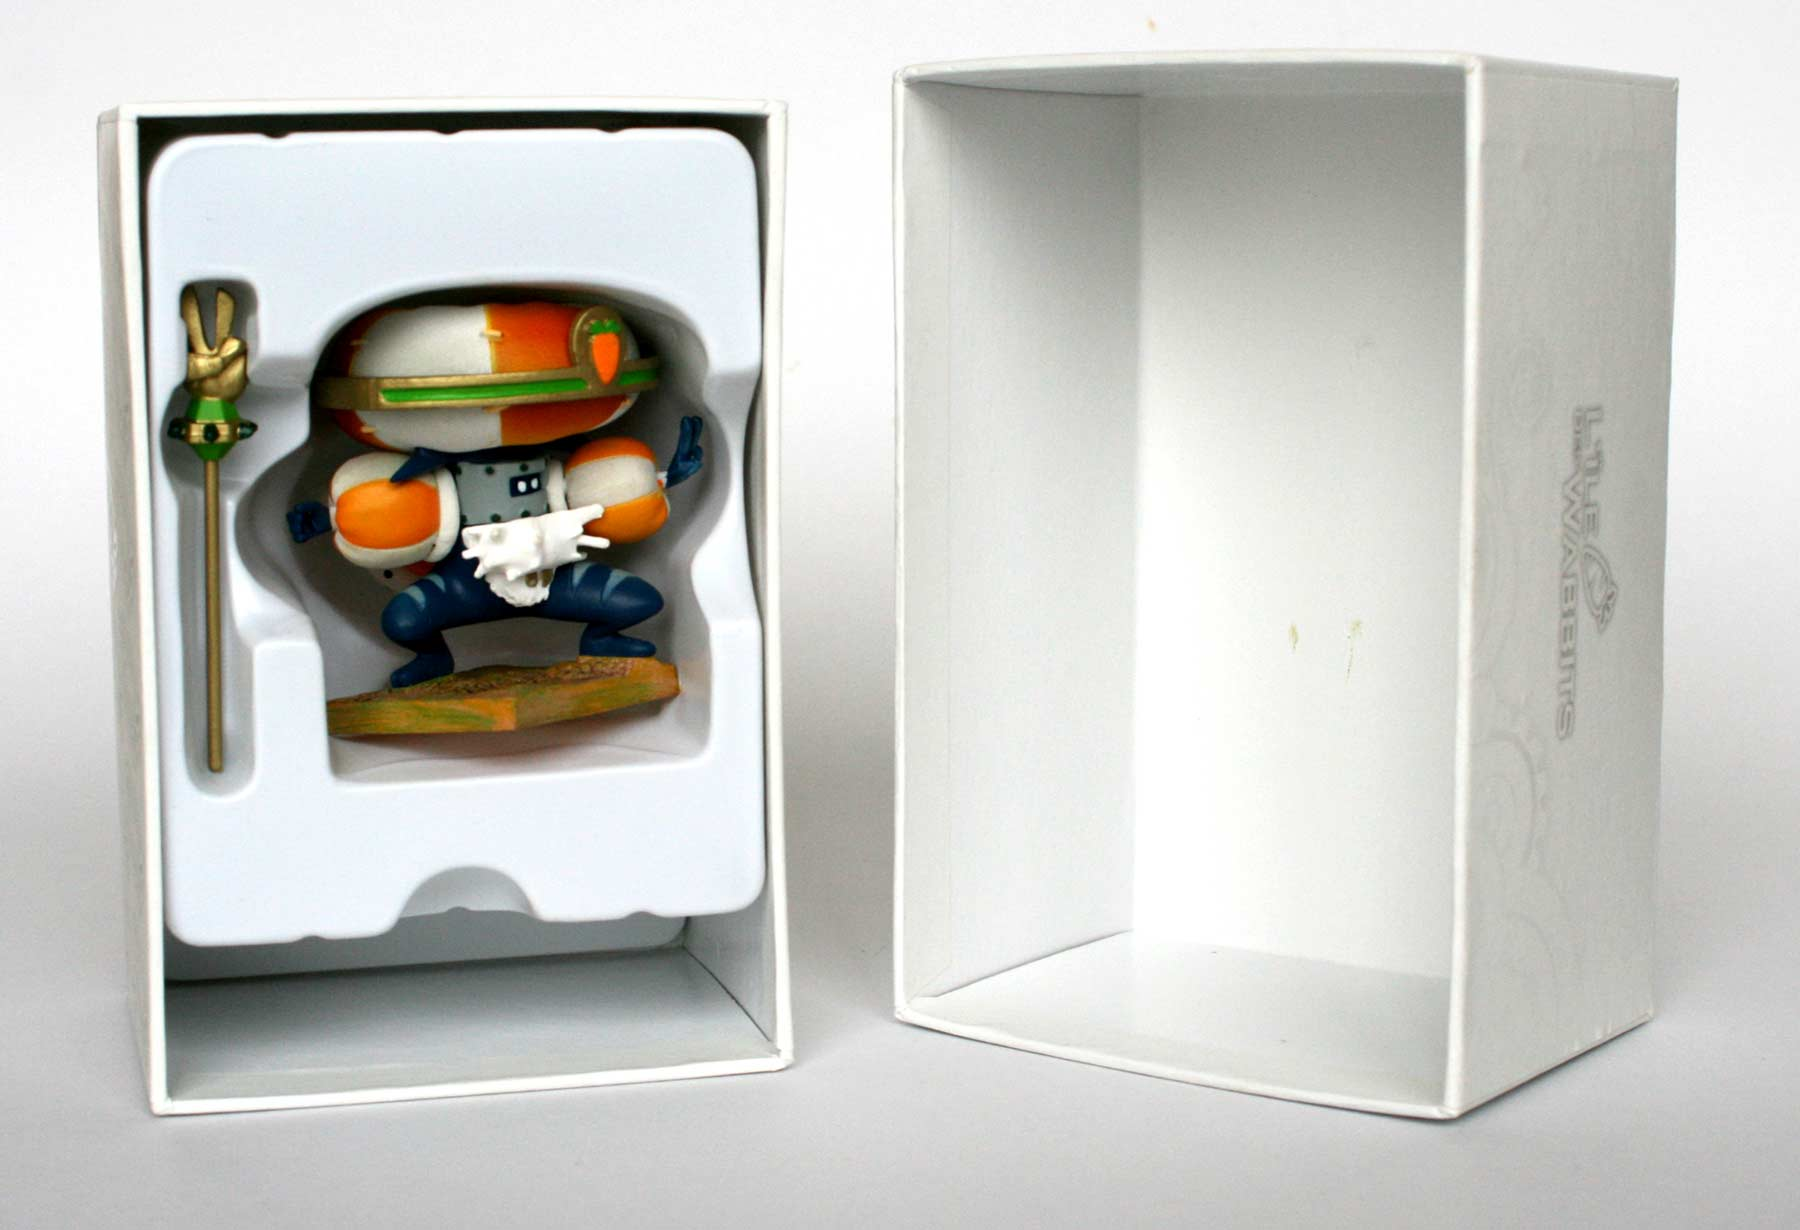 Wa_Wabbit_Dofus_figurine_pakaging_ouverture_04